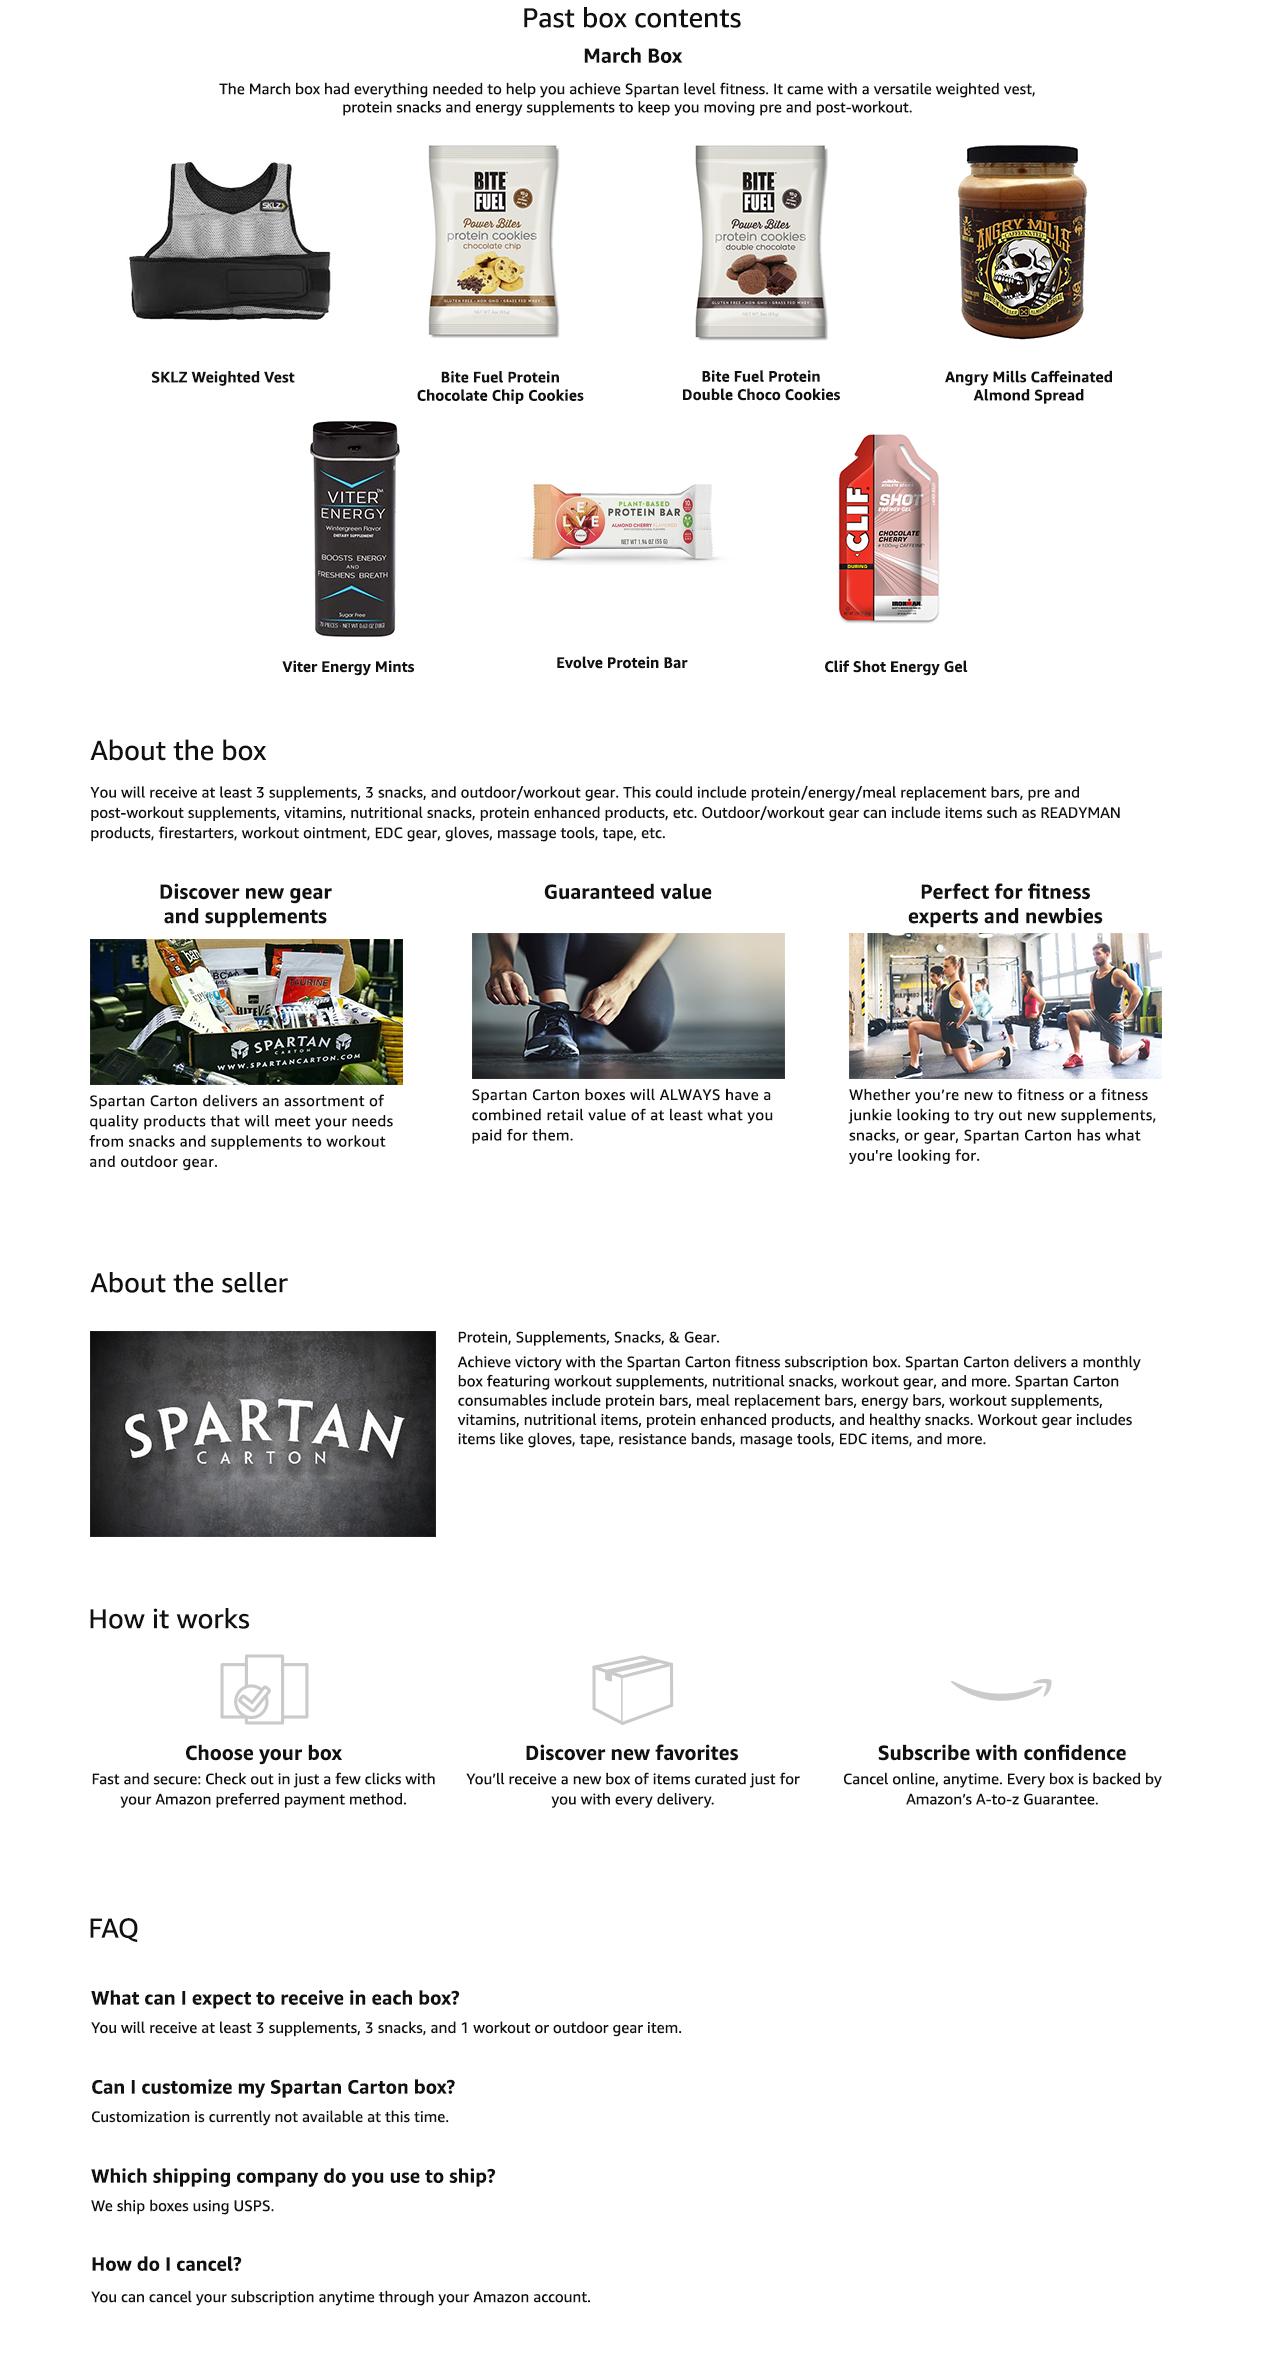 Amazon.com  Spartan Carton  Memberships and Subscriptions 7a7abec3e4